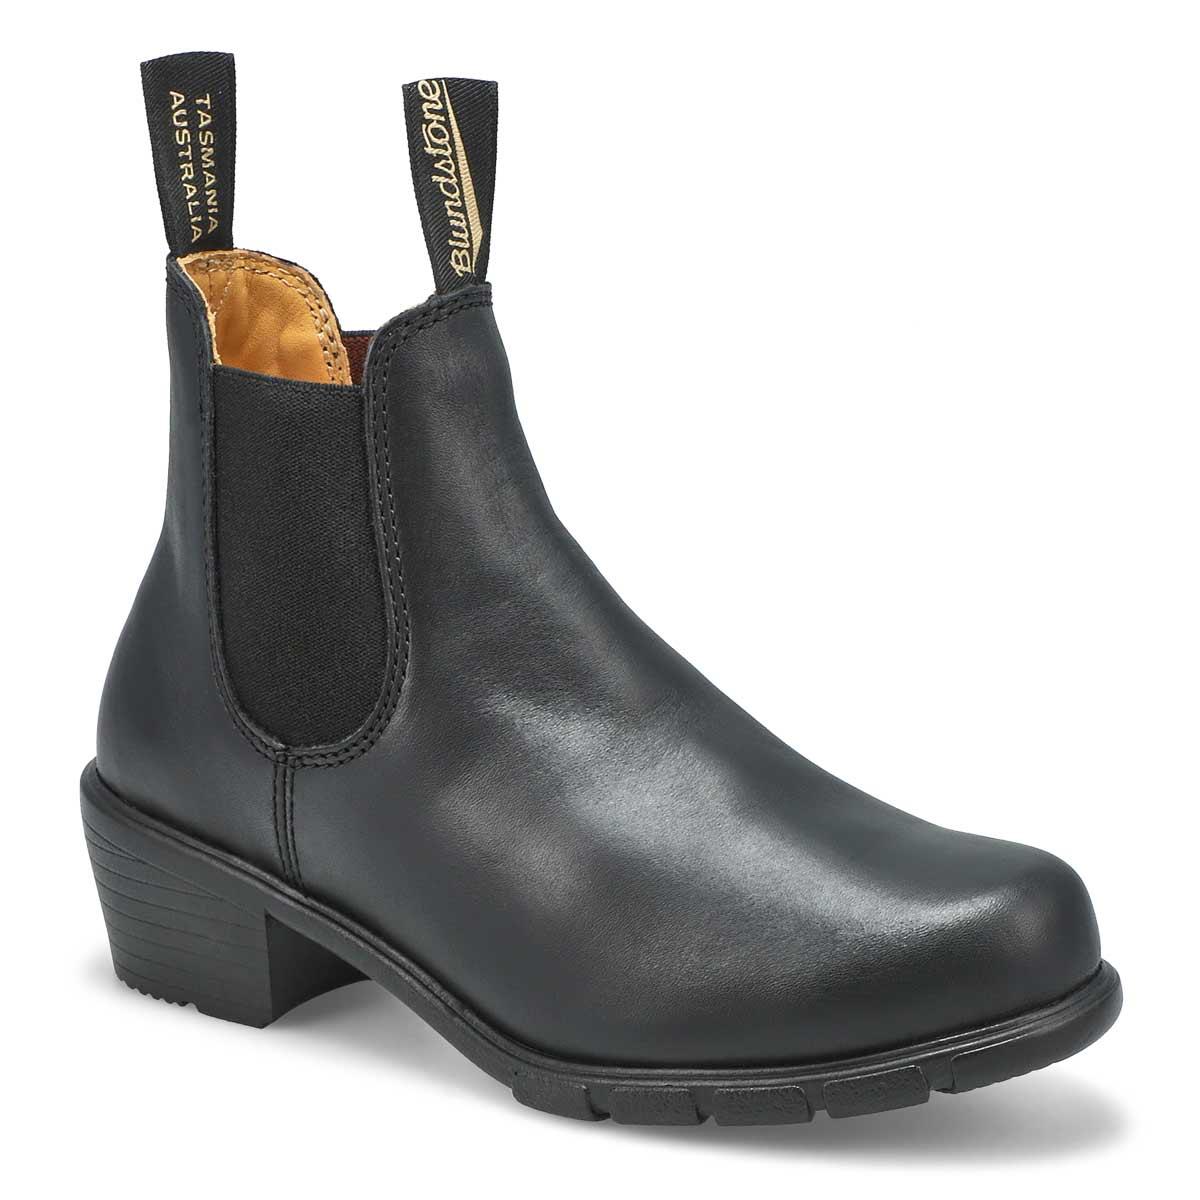 Women's 1671 Chelsea Boot - Black